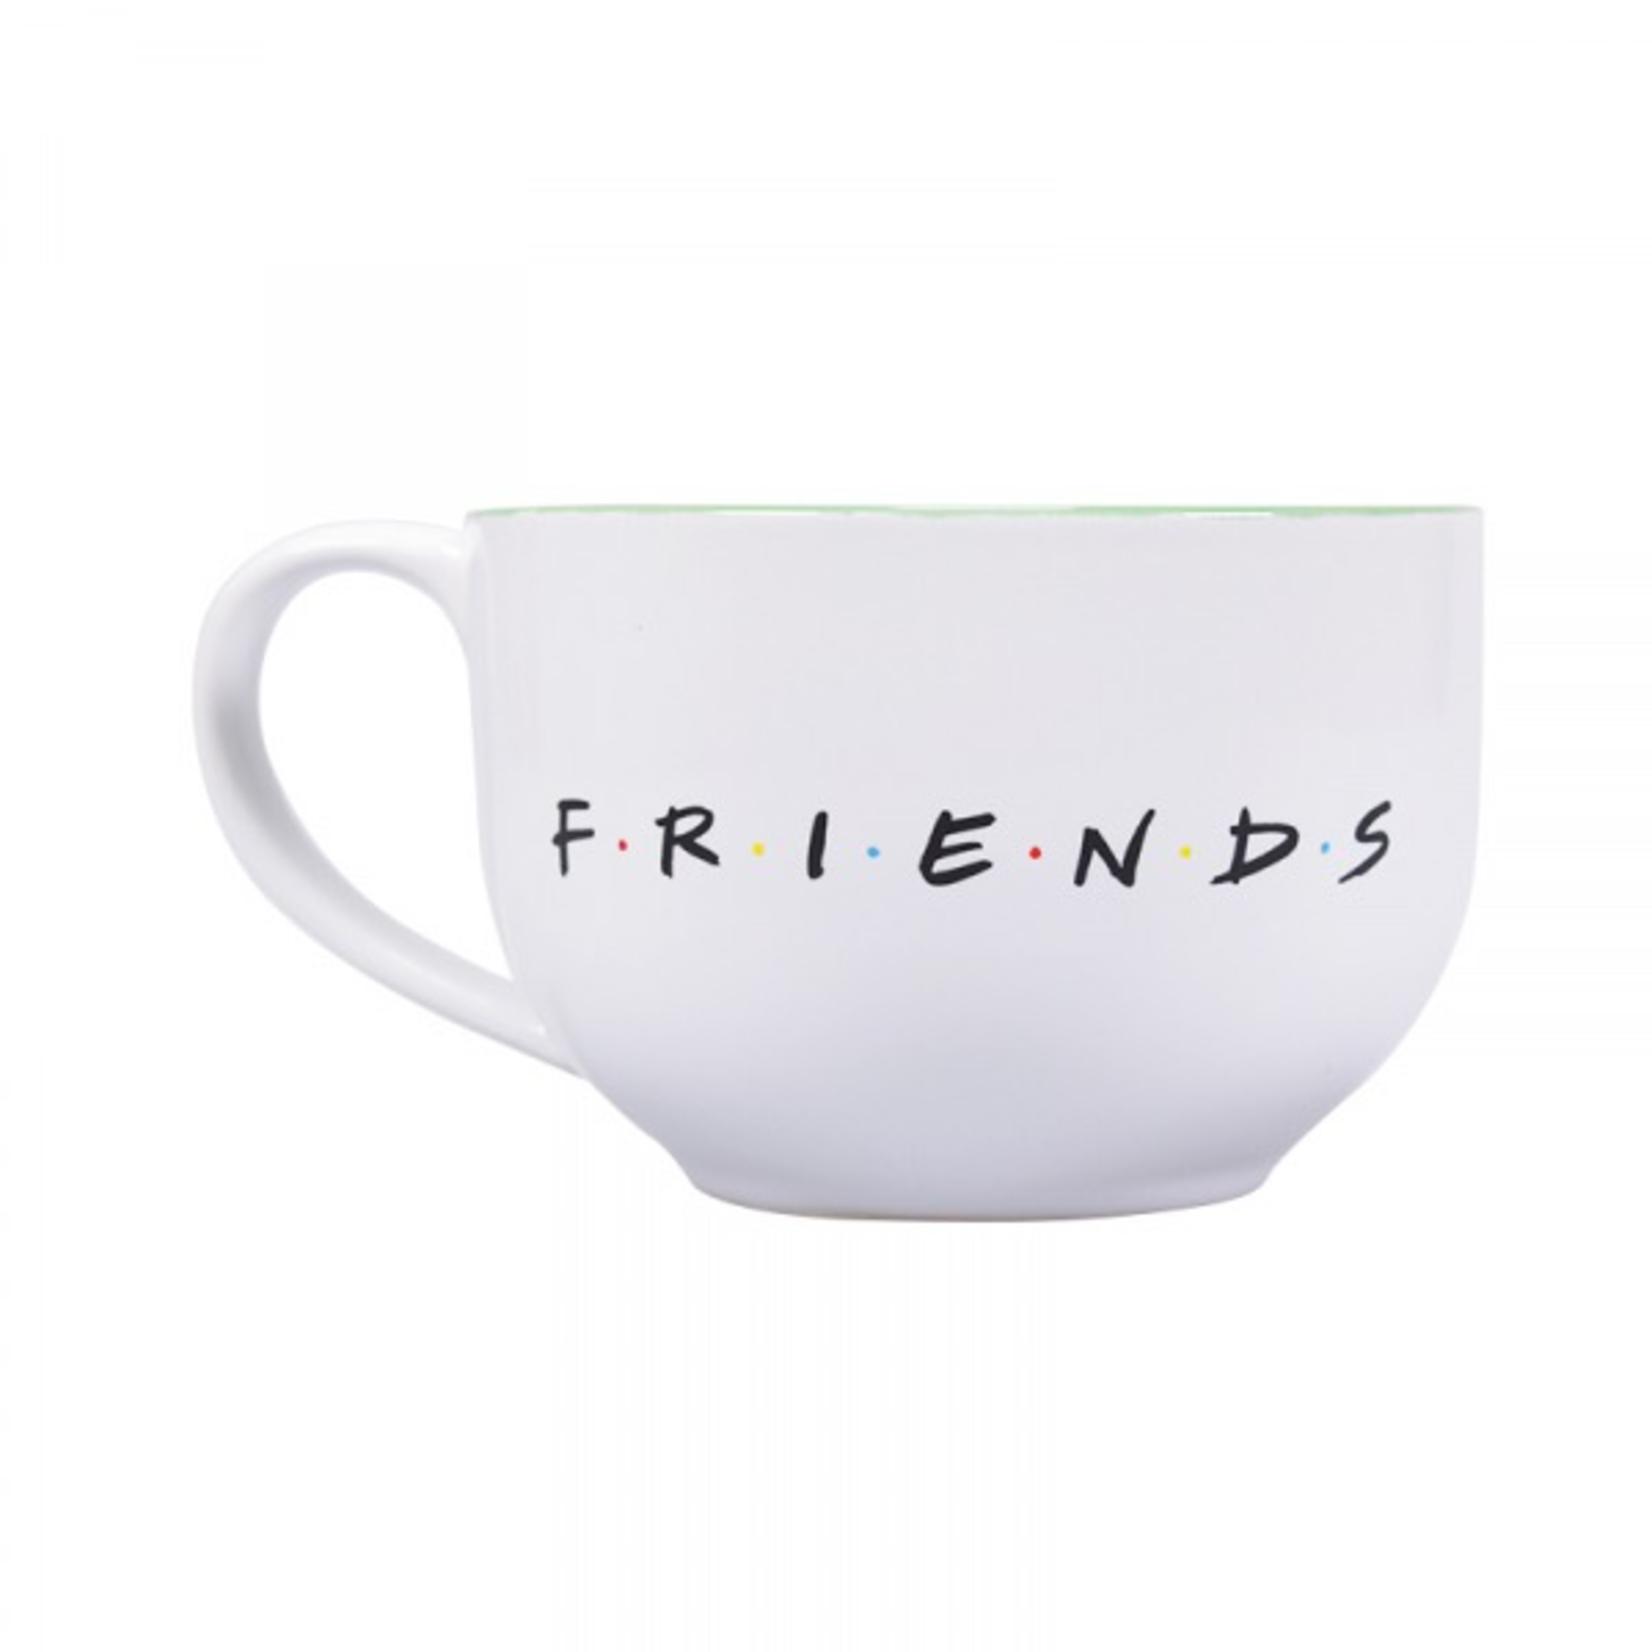 Half Moon Bay Friends Large Mug - Central Perk